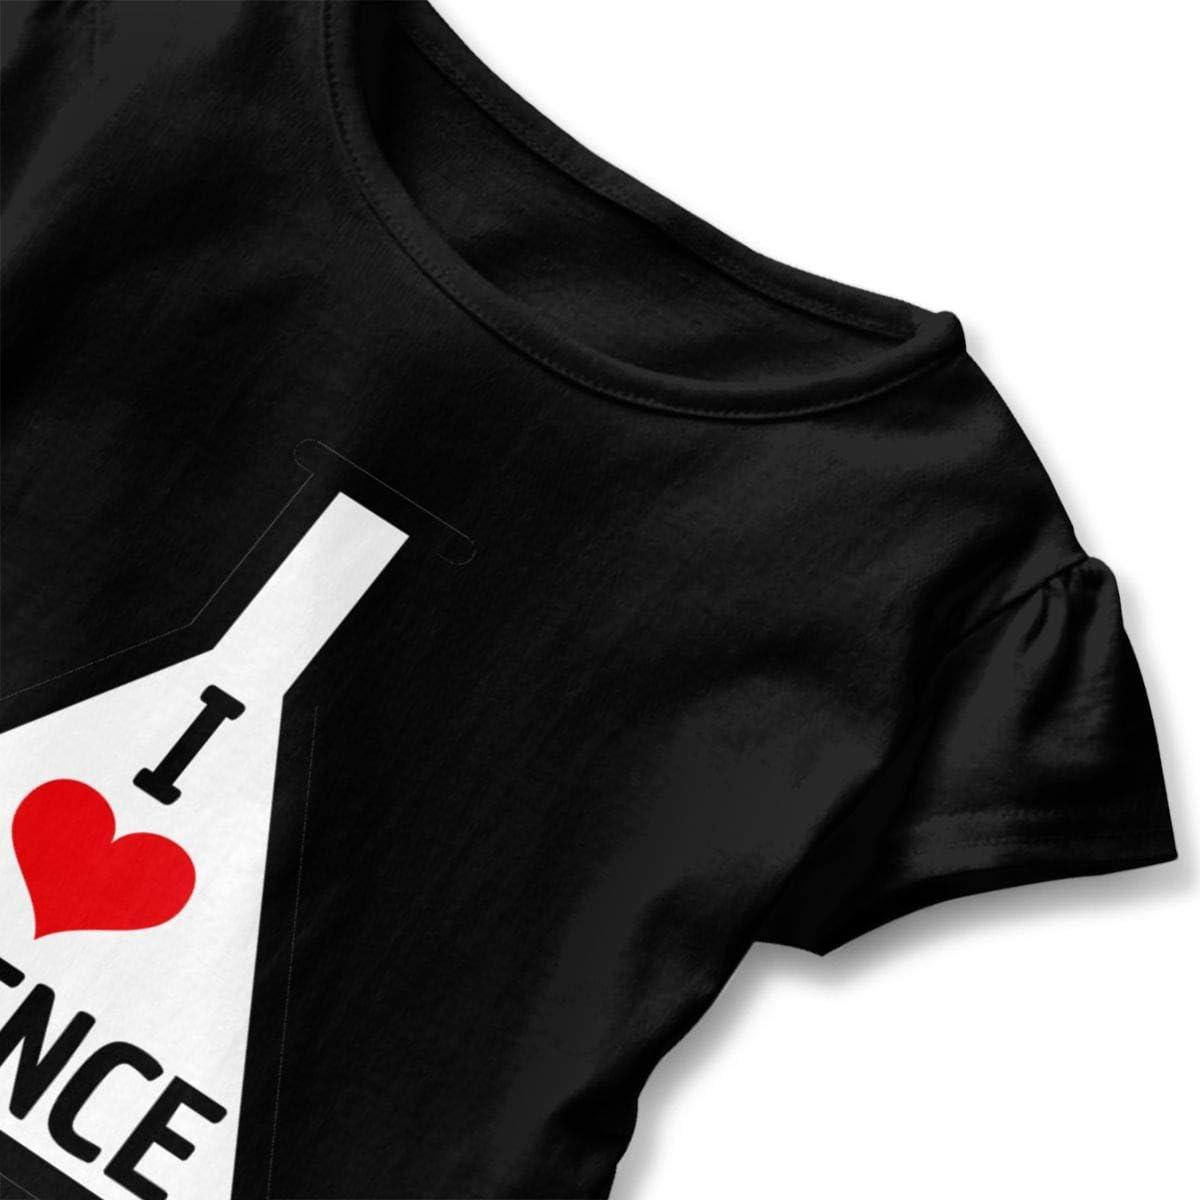 I Love Science Shirt Baby Girls Ruffles Short Sleeve Tee Shirts for 2-6 Years Old Baby